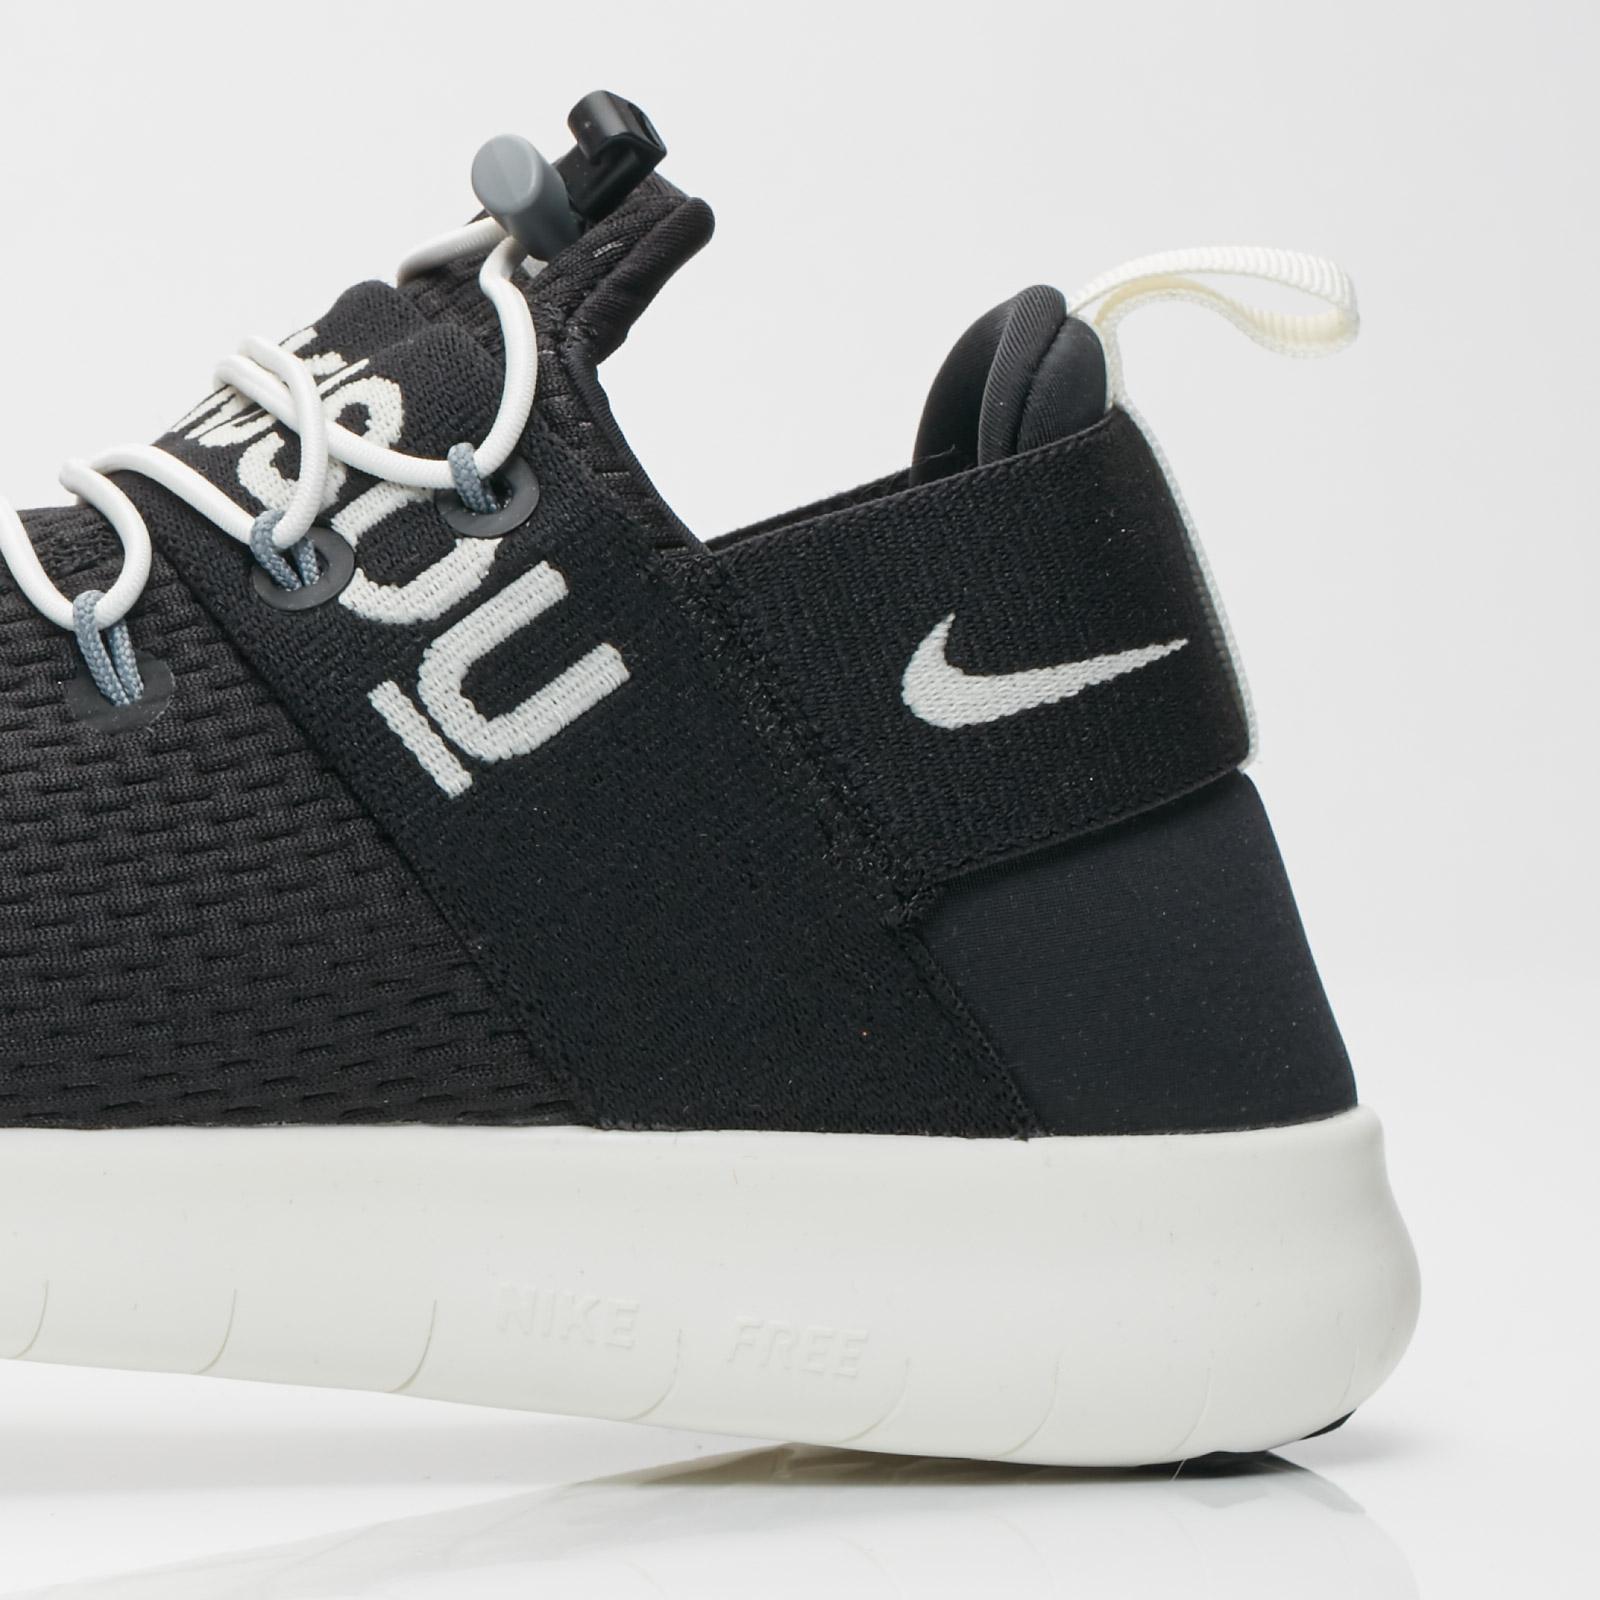 7dfebd2df574c Nike Free Run CMTR 2017 - 904732-001 - Sneakersnstuff